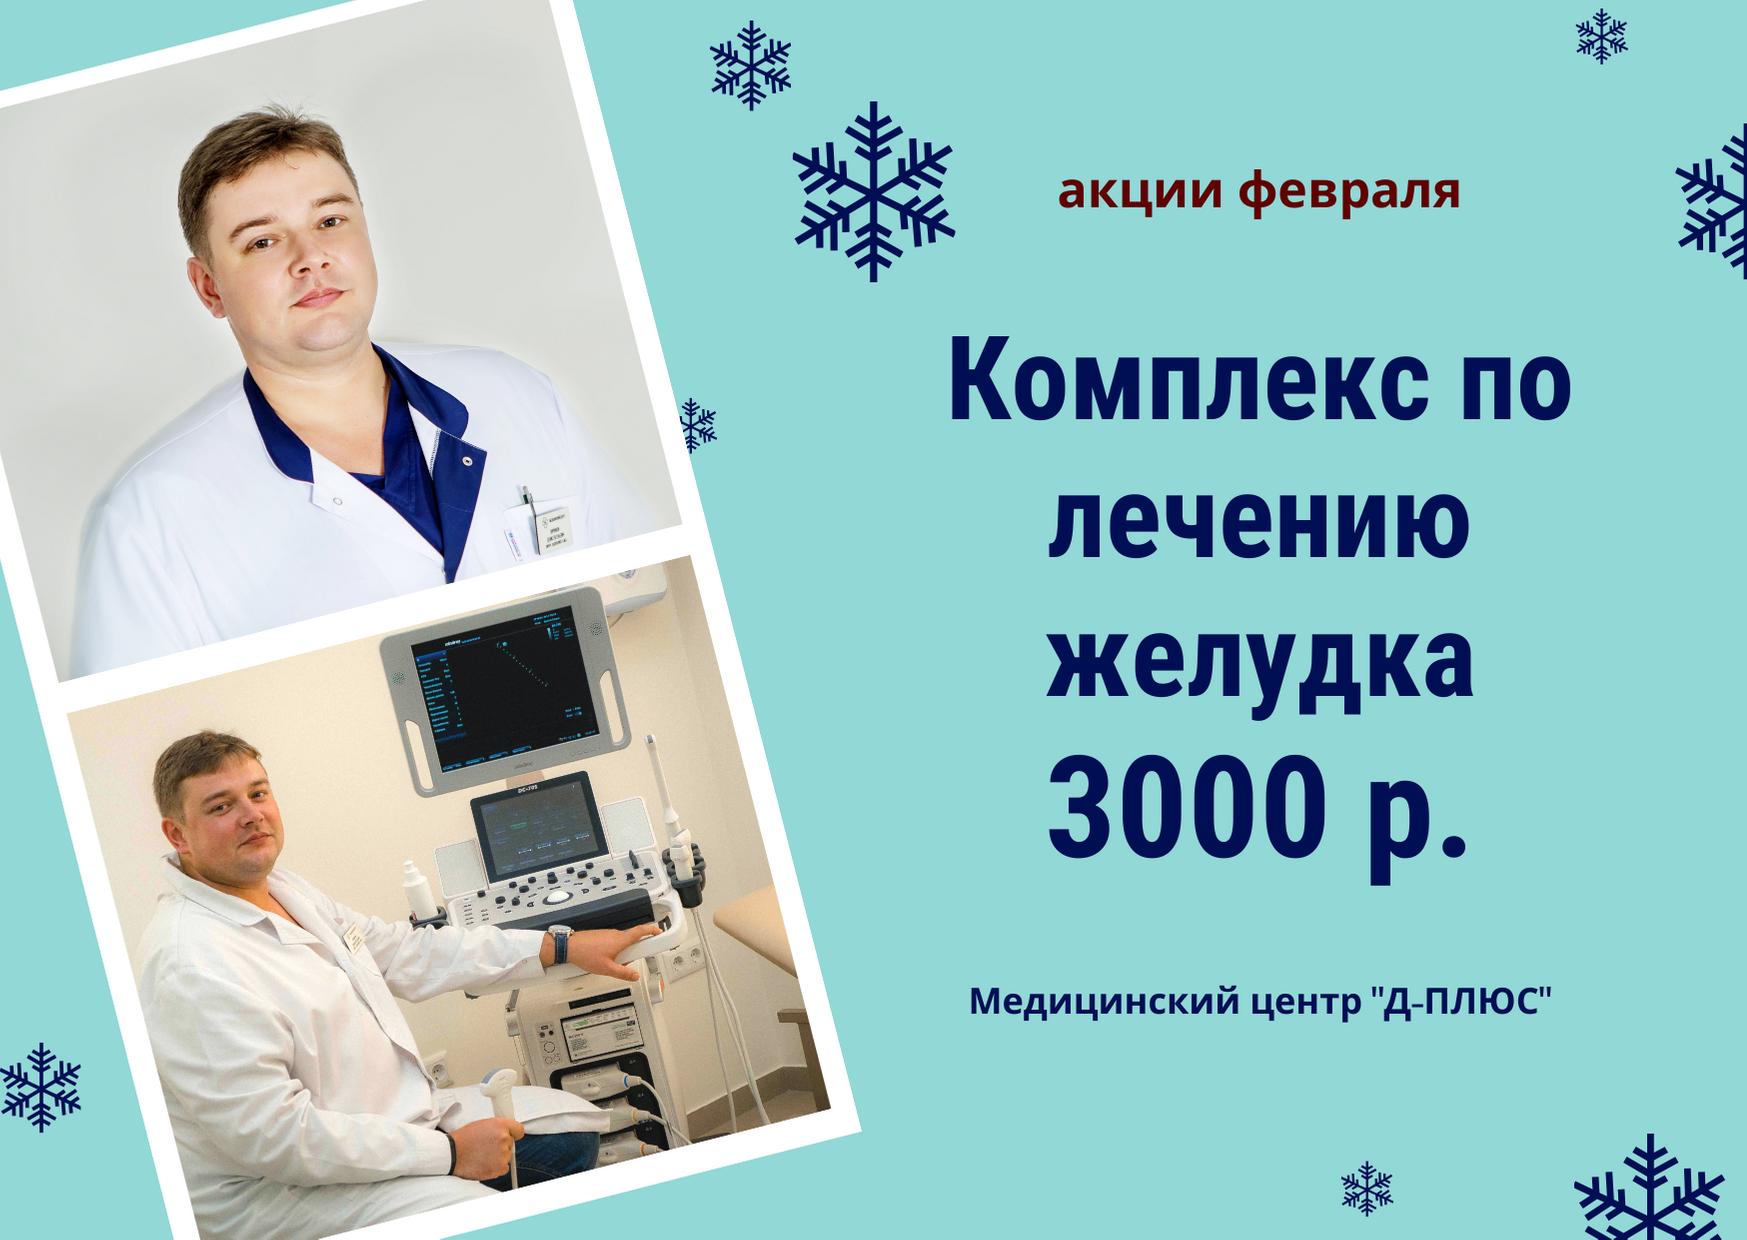 После 24/02 – Комплекс по лечению желудка – 3000 руб.